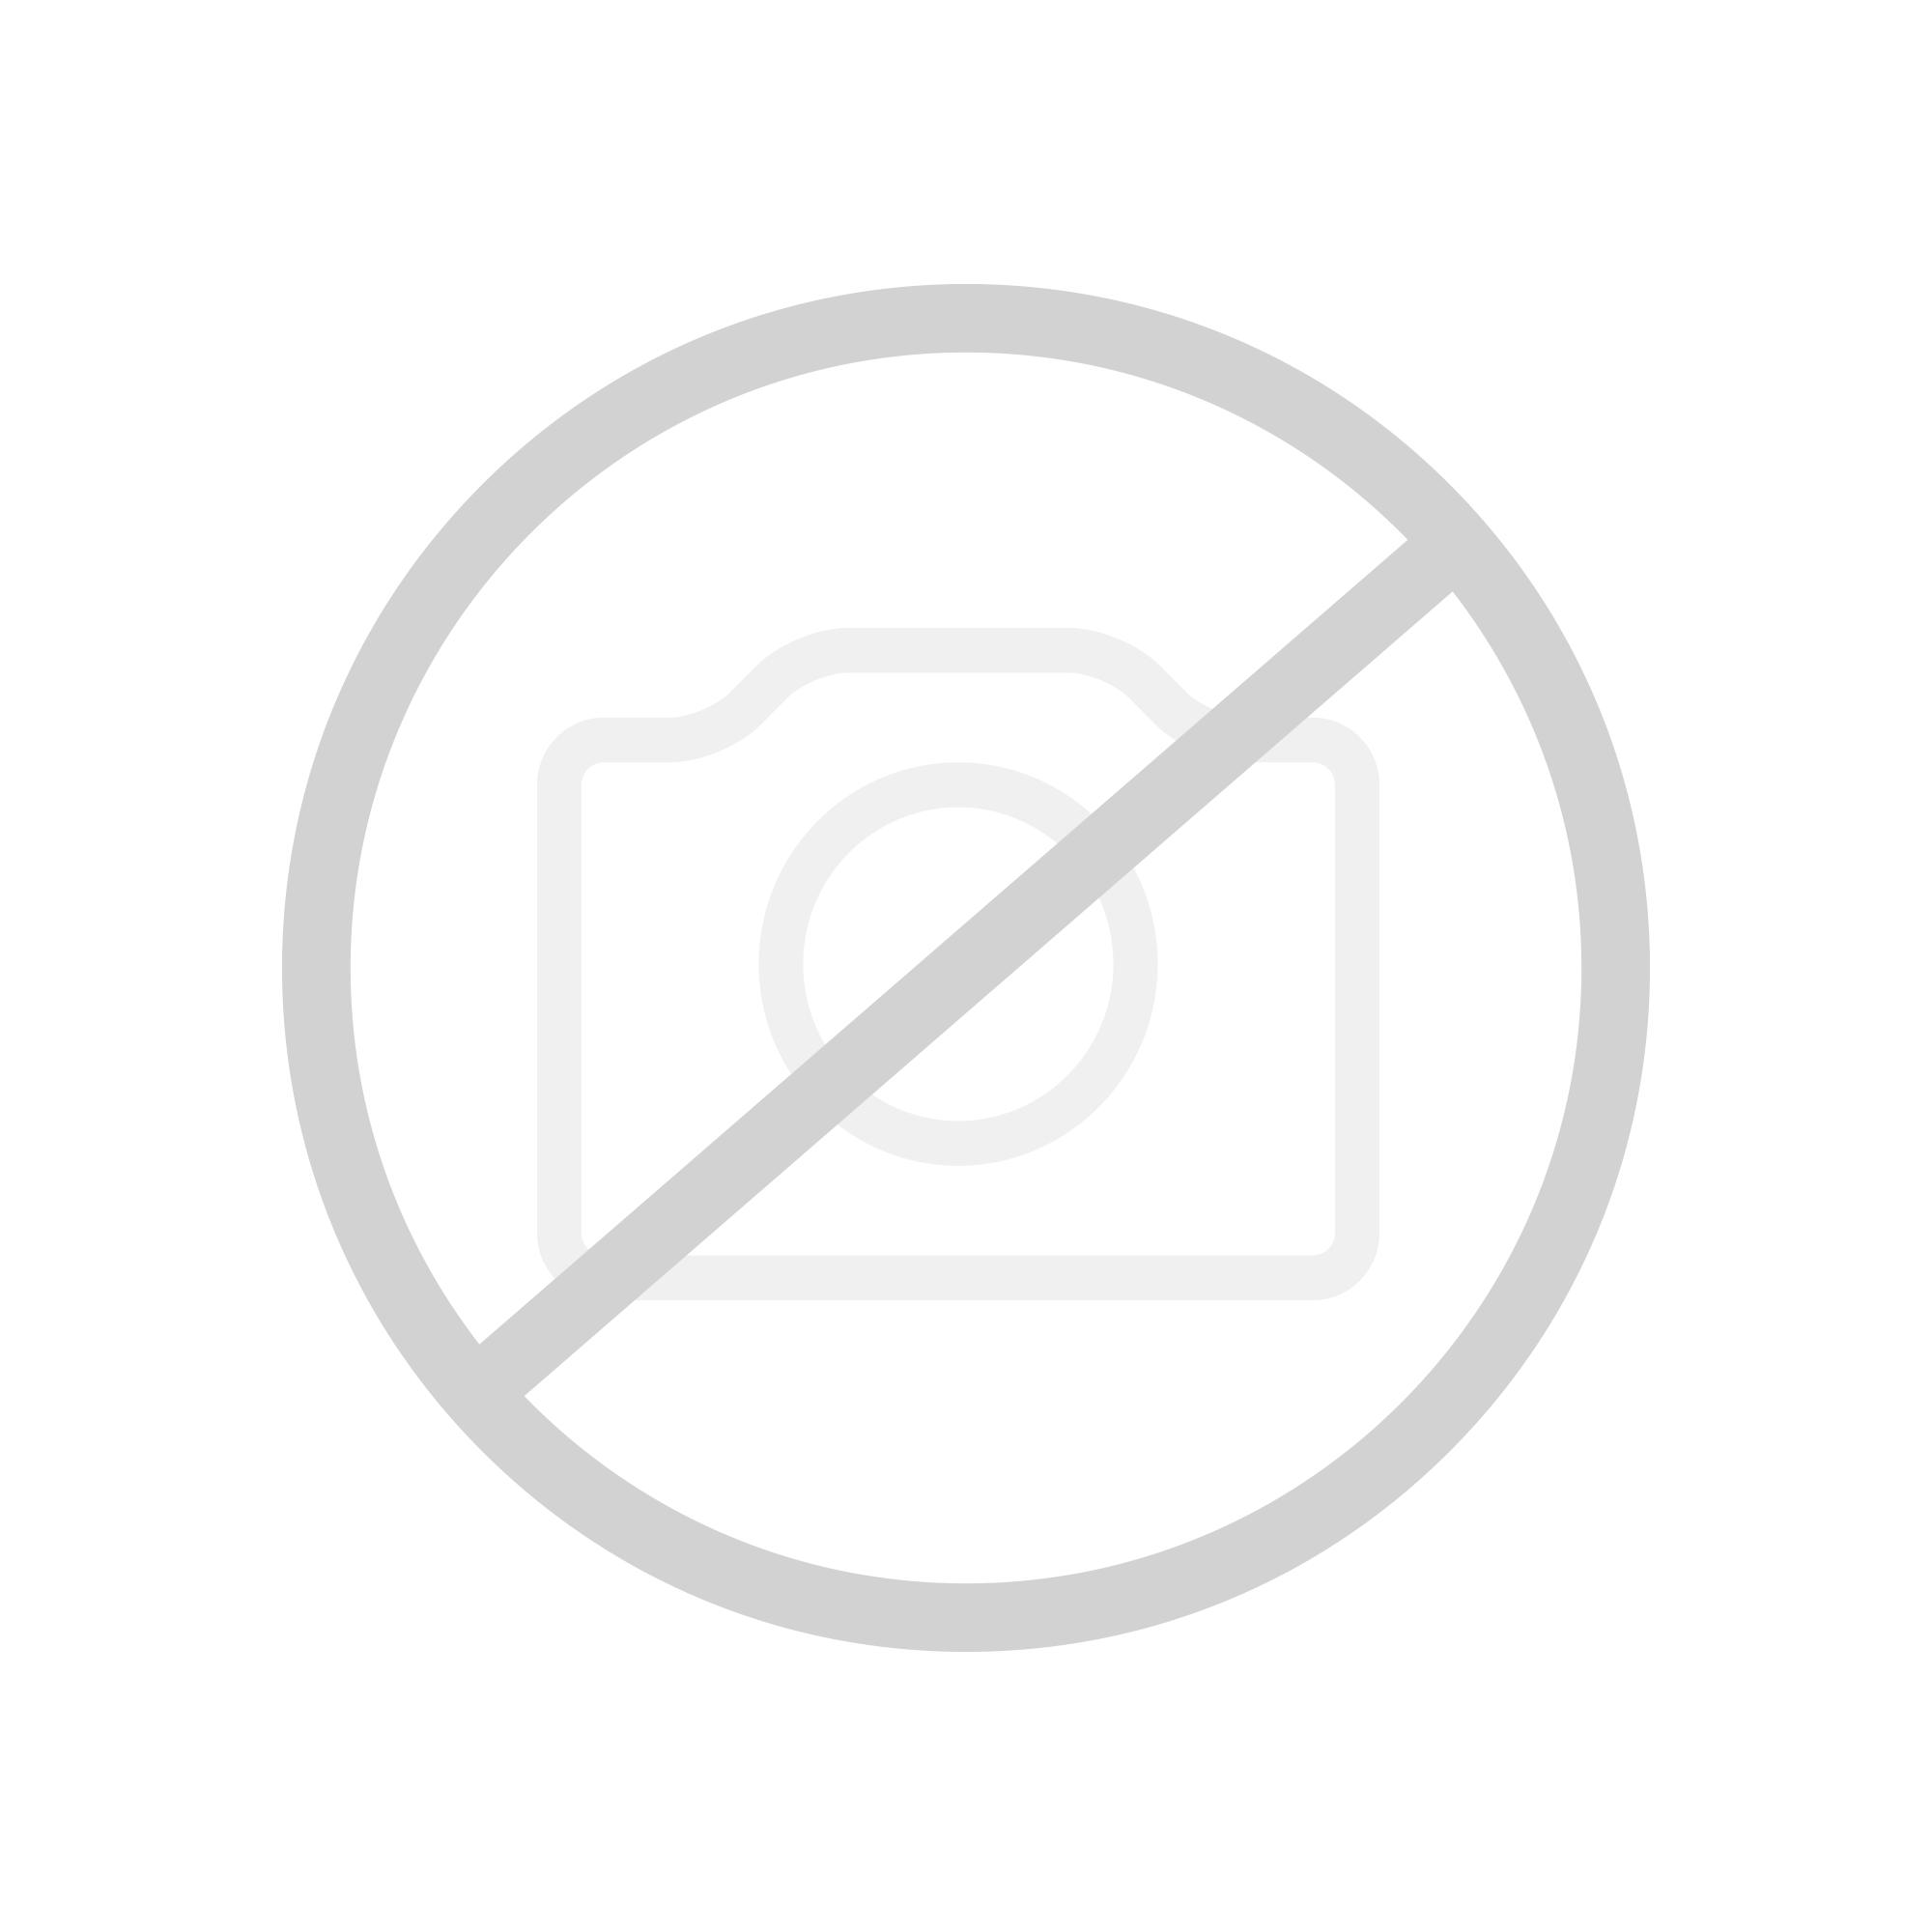 dornbracht haken platin matt 83251979 06. Black Bedroom Furniture Sets. Home Design Ideas